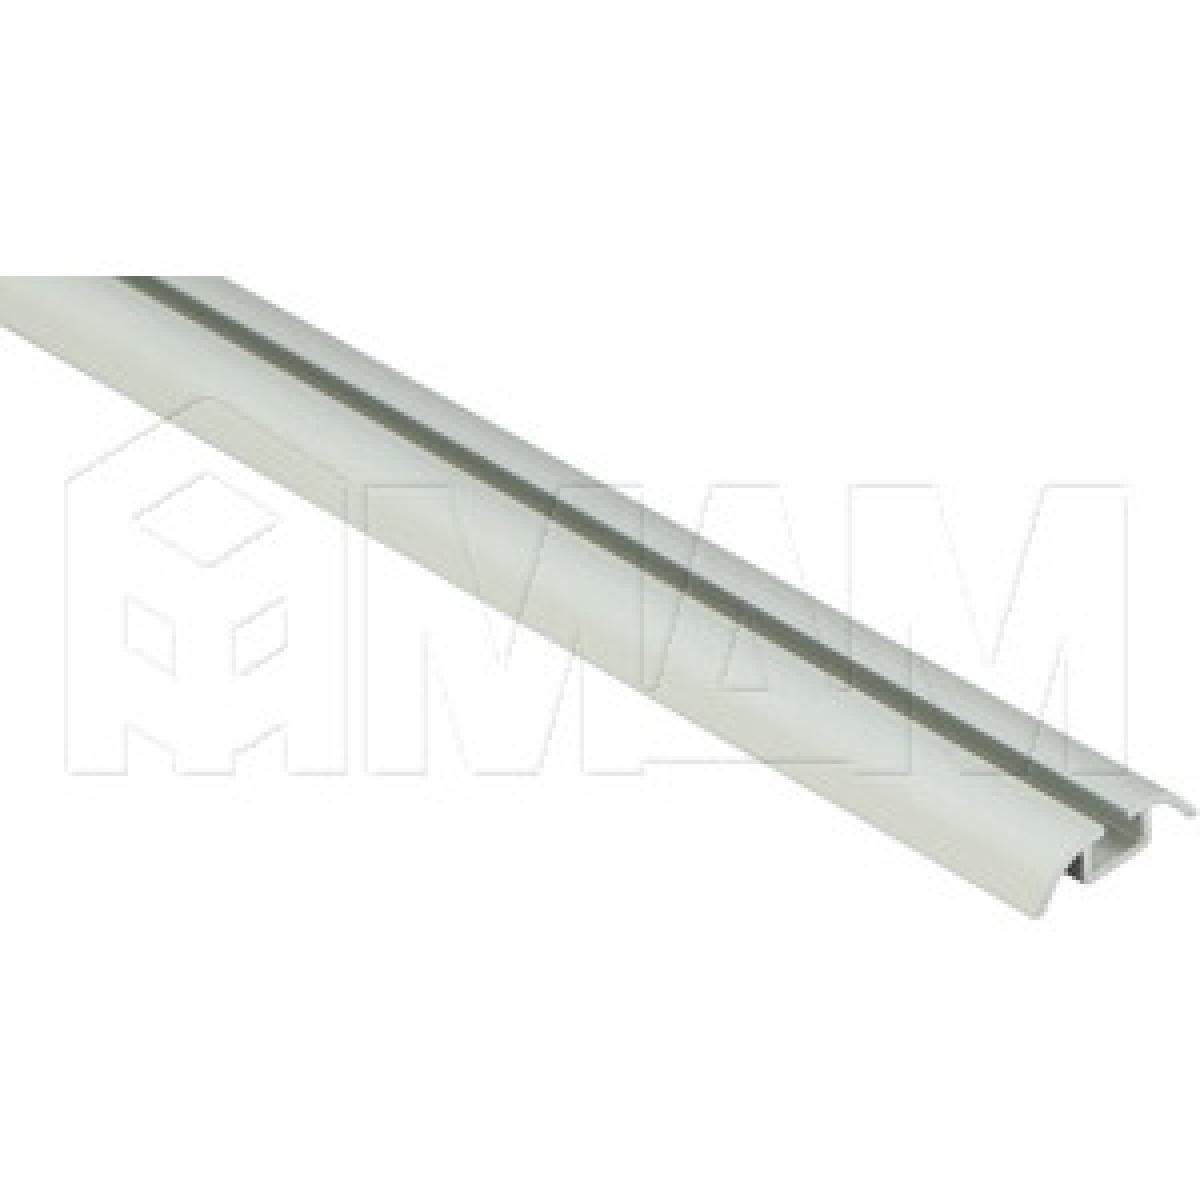 INTEGRO Направляющая одинарная нижняя серебро, L-6000